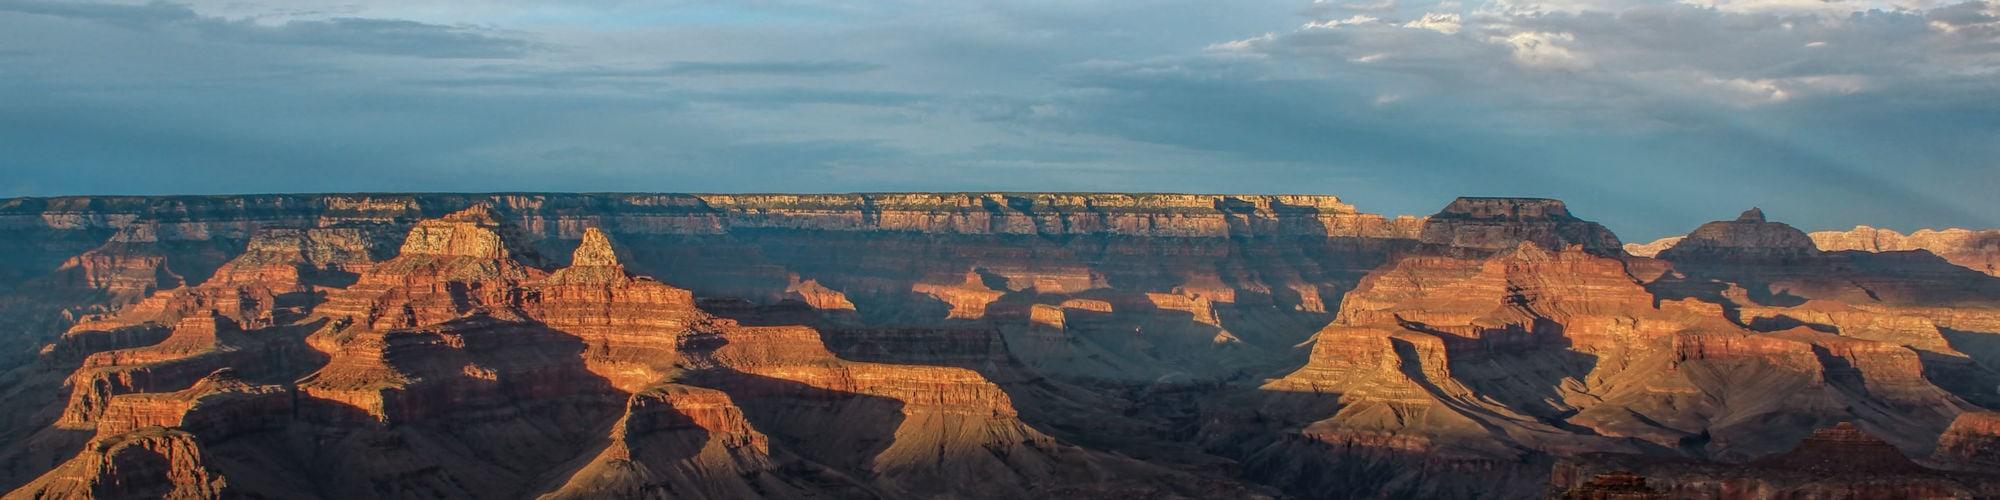 Reiseberichte Grand Canyon